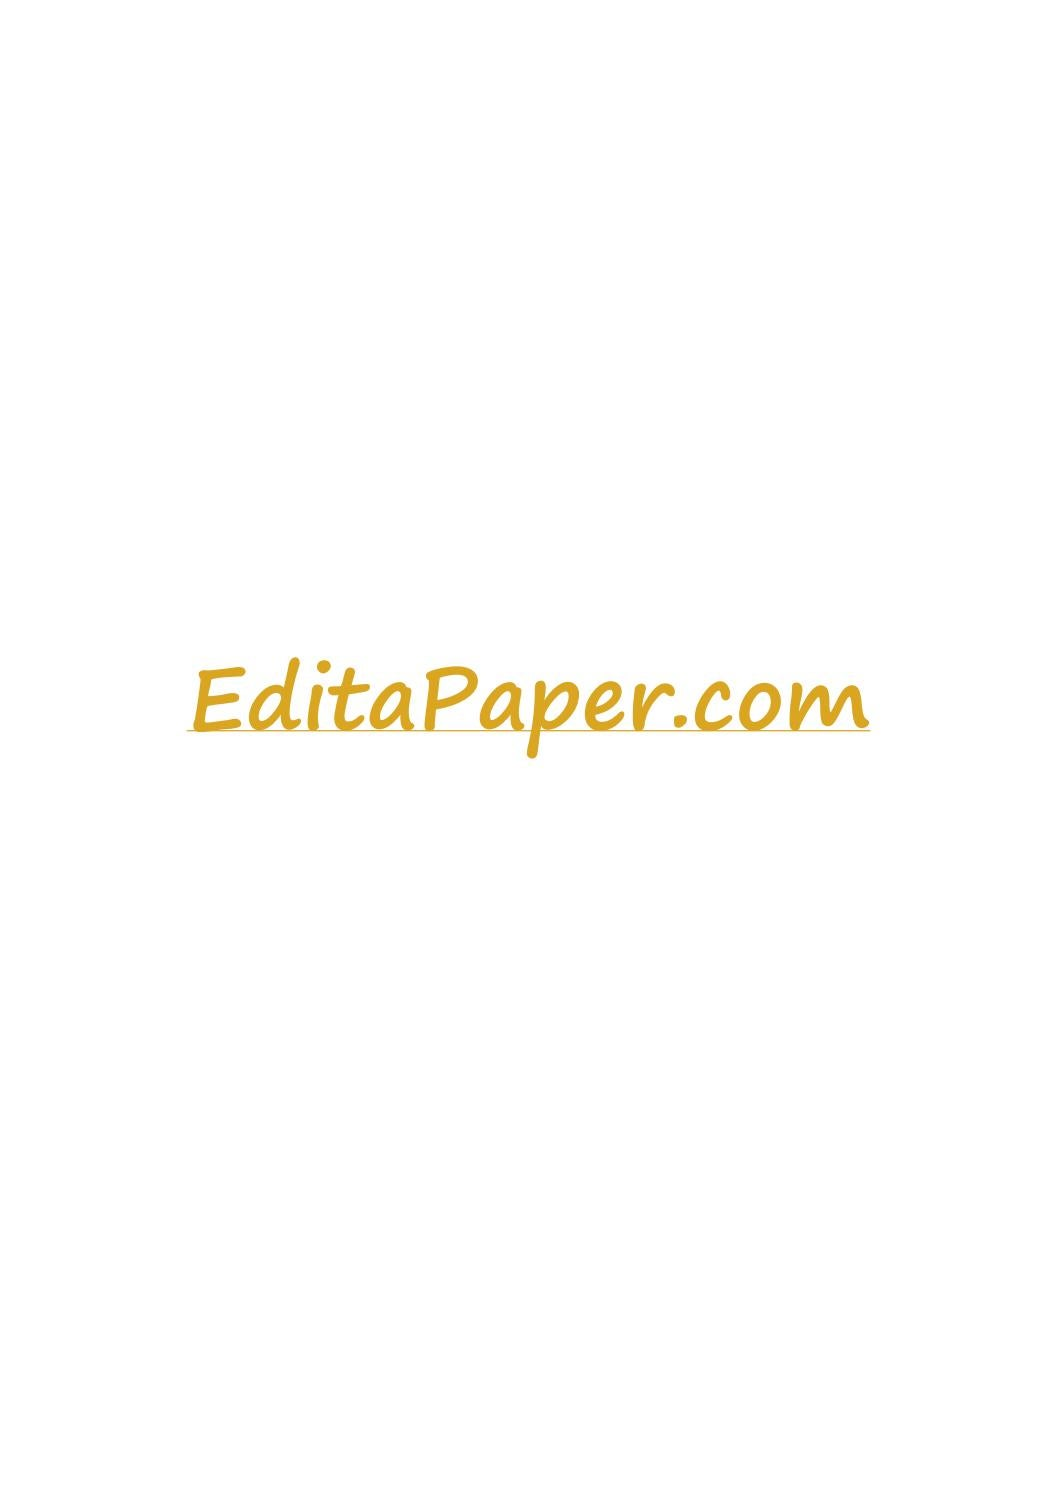 Astronomy editor services